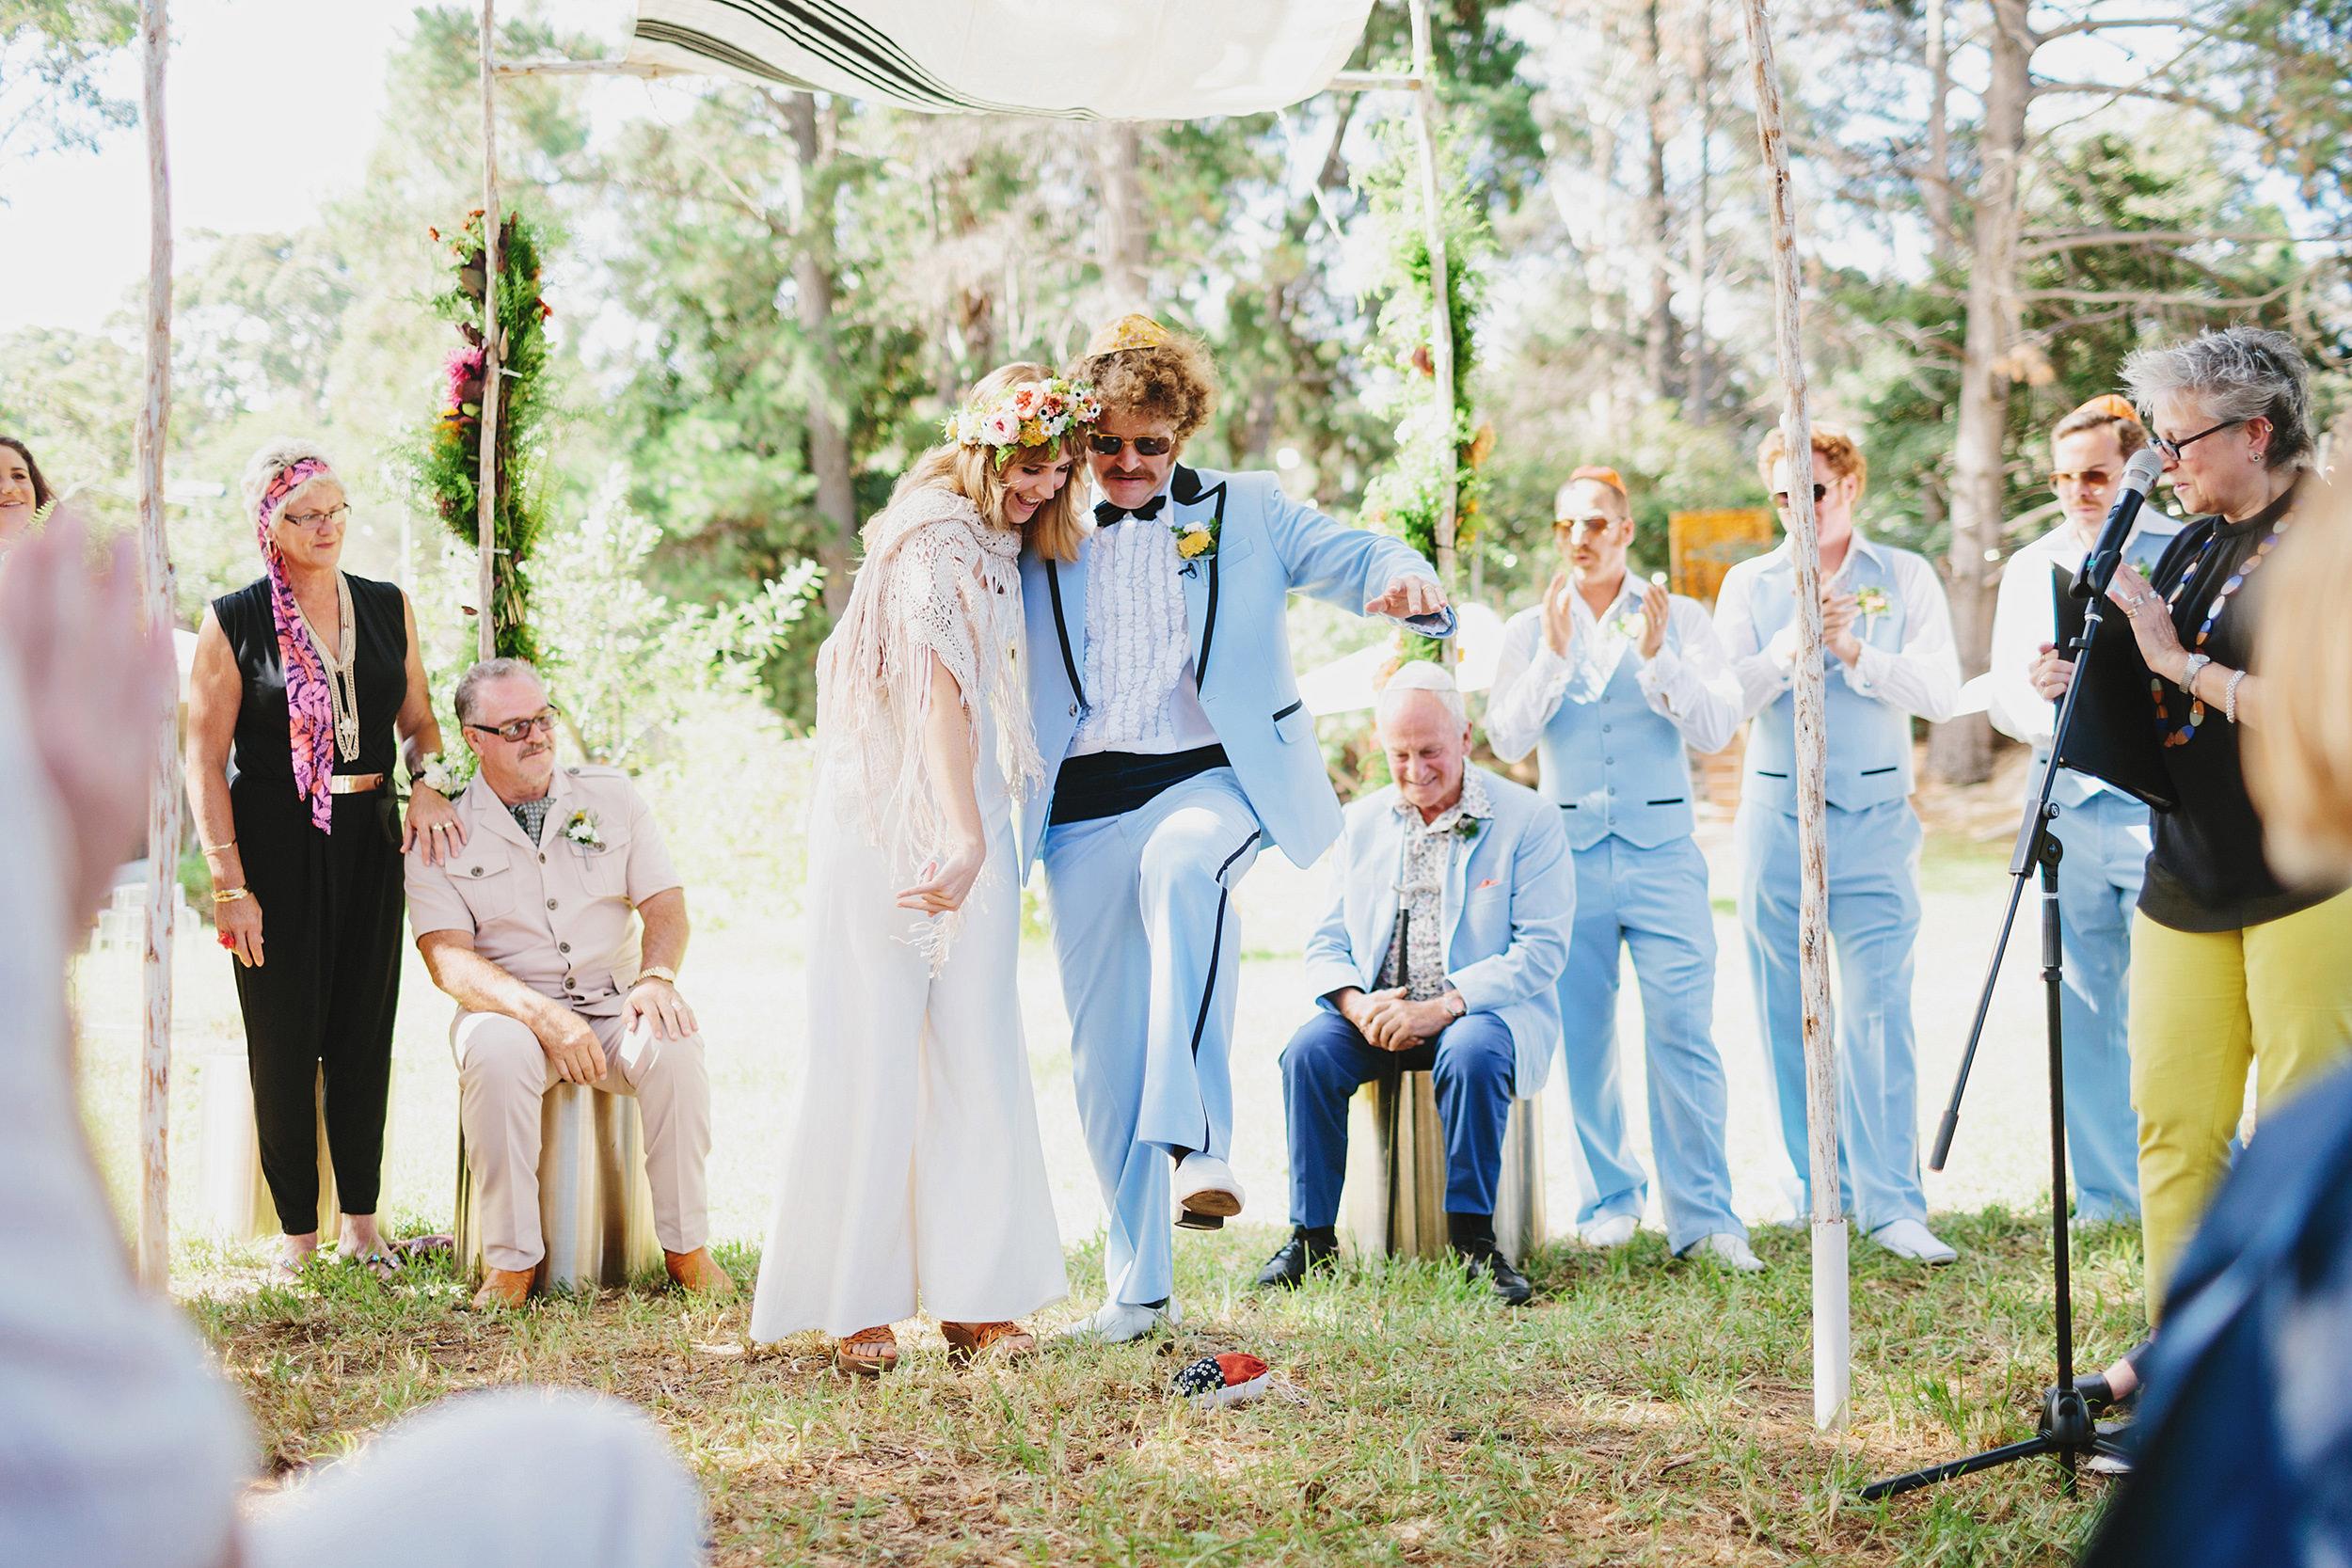 Melbourne_Vintage_Backyard_Wedding_Ben_Erin 040.JPG